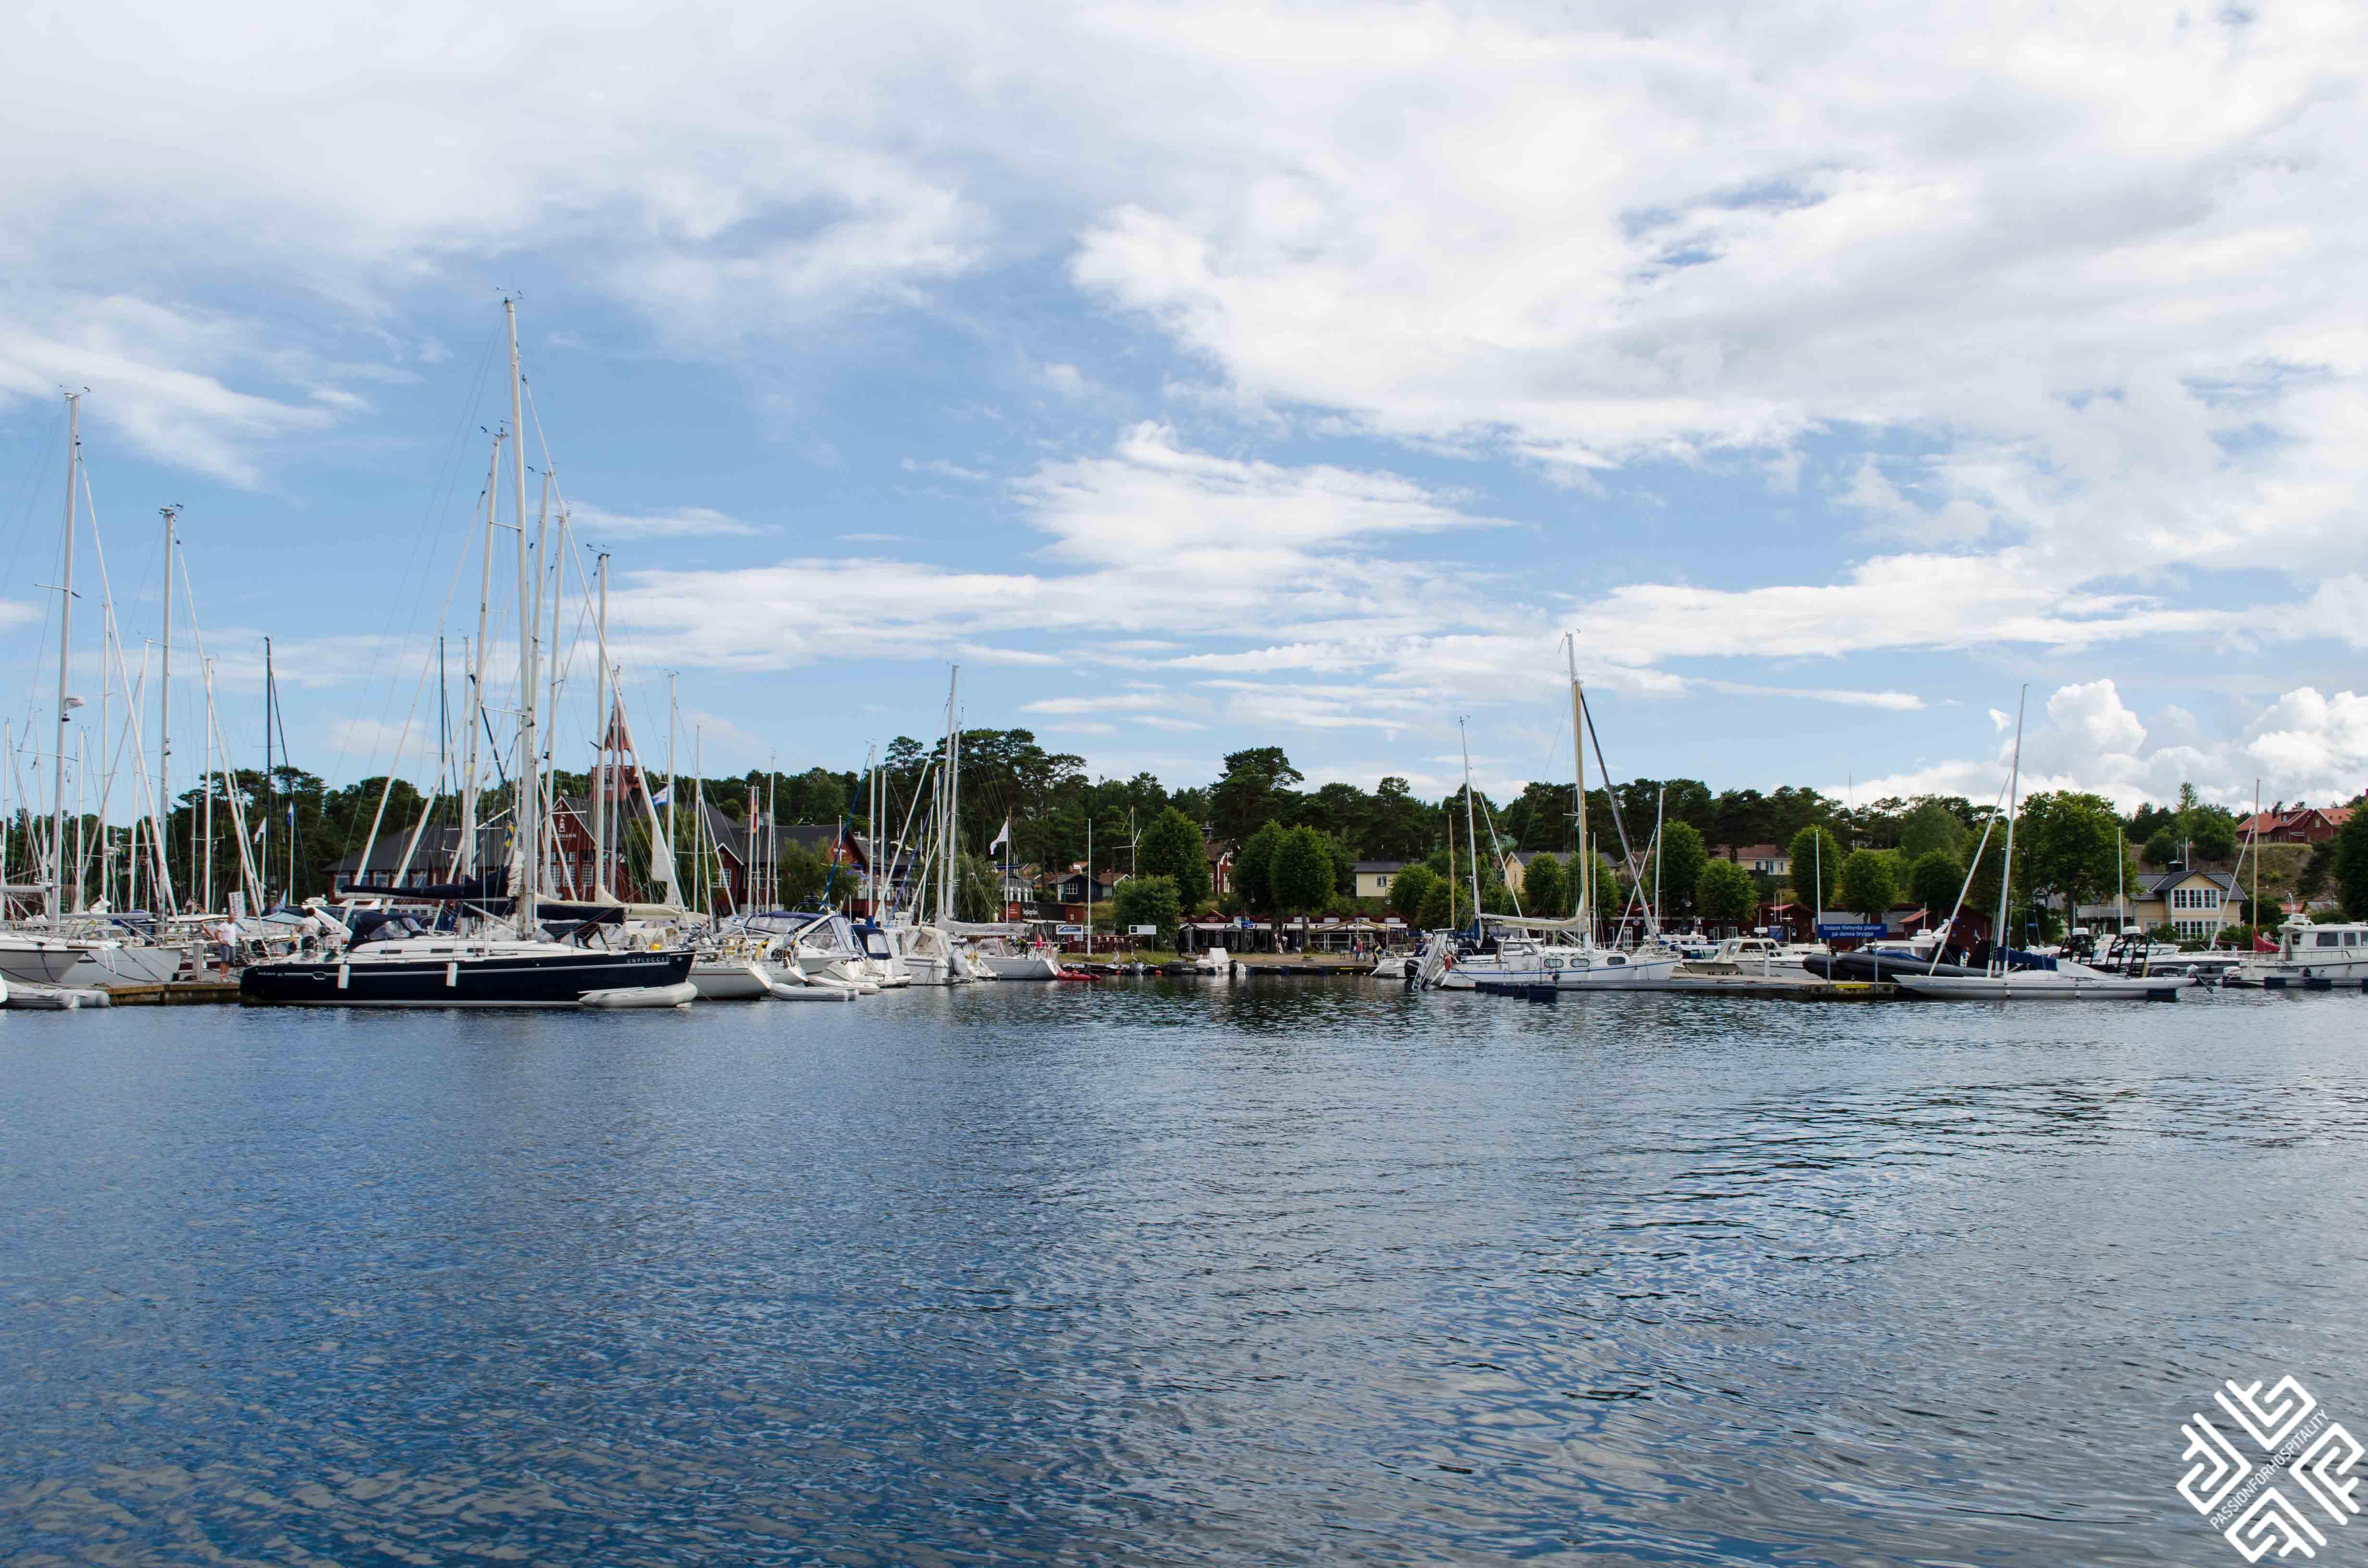 stockholm_archipelago_sandhamn-1